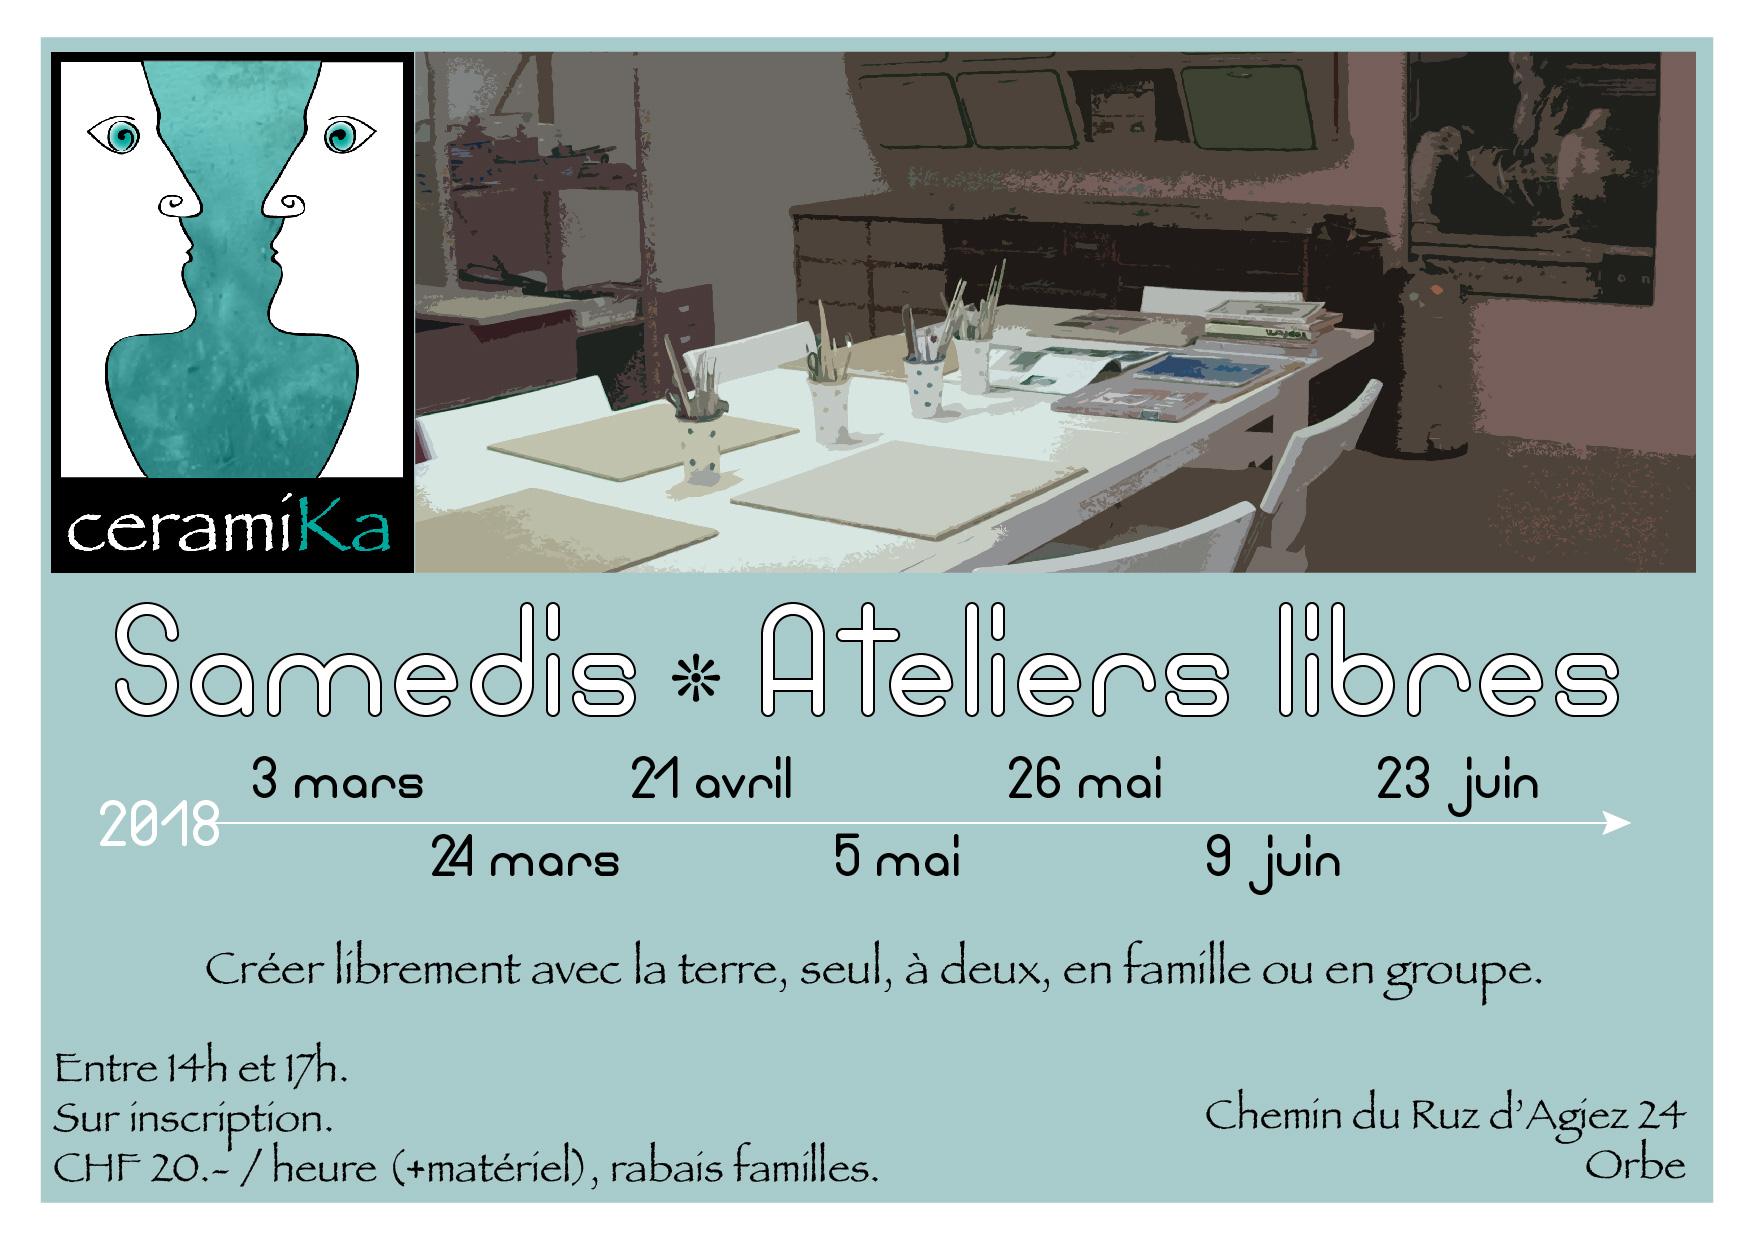 atelier_libre_print